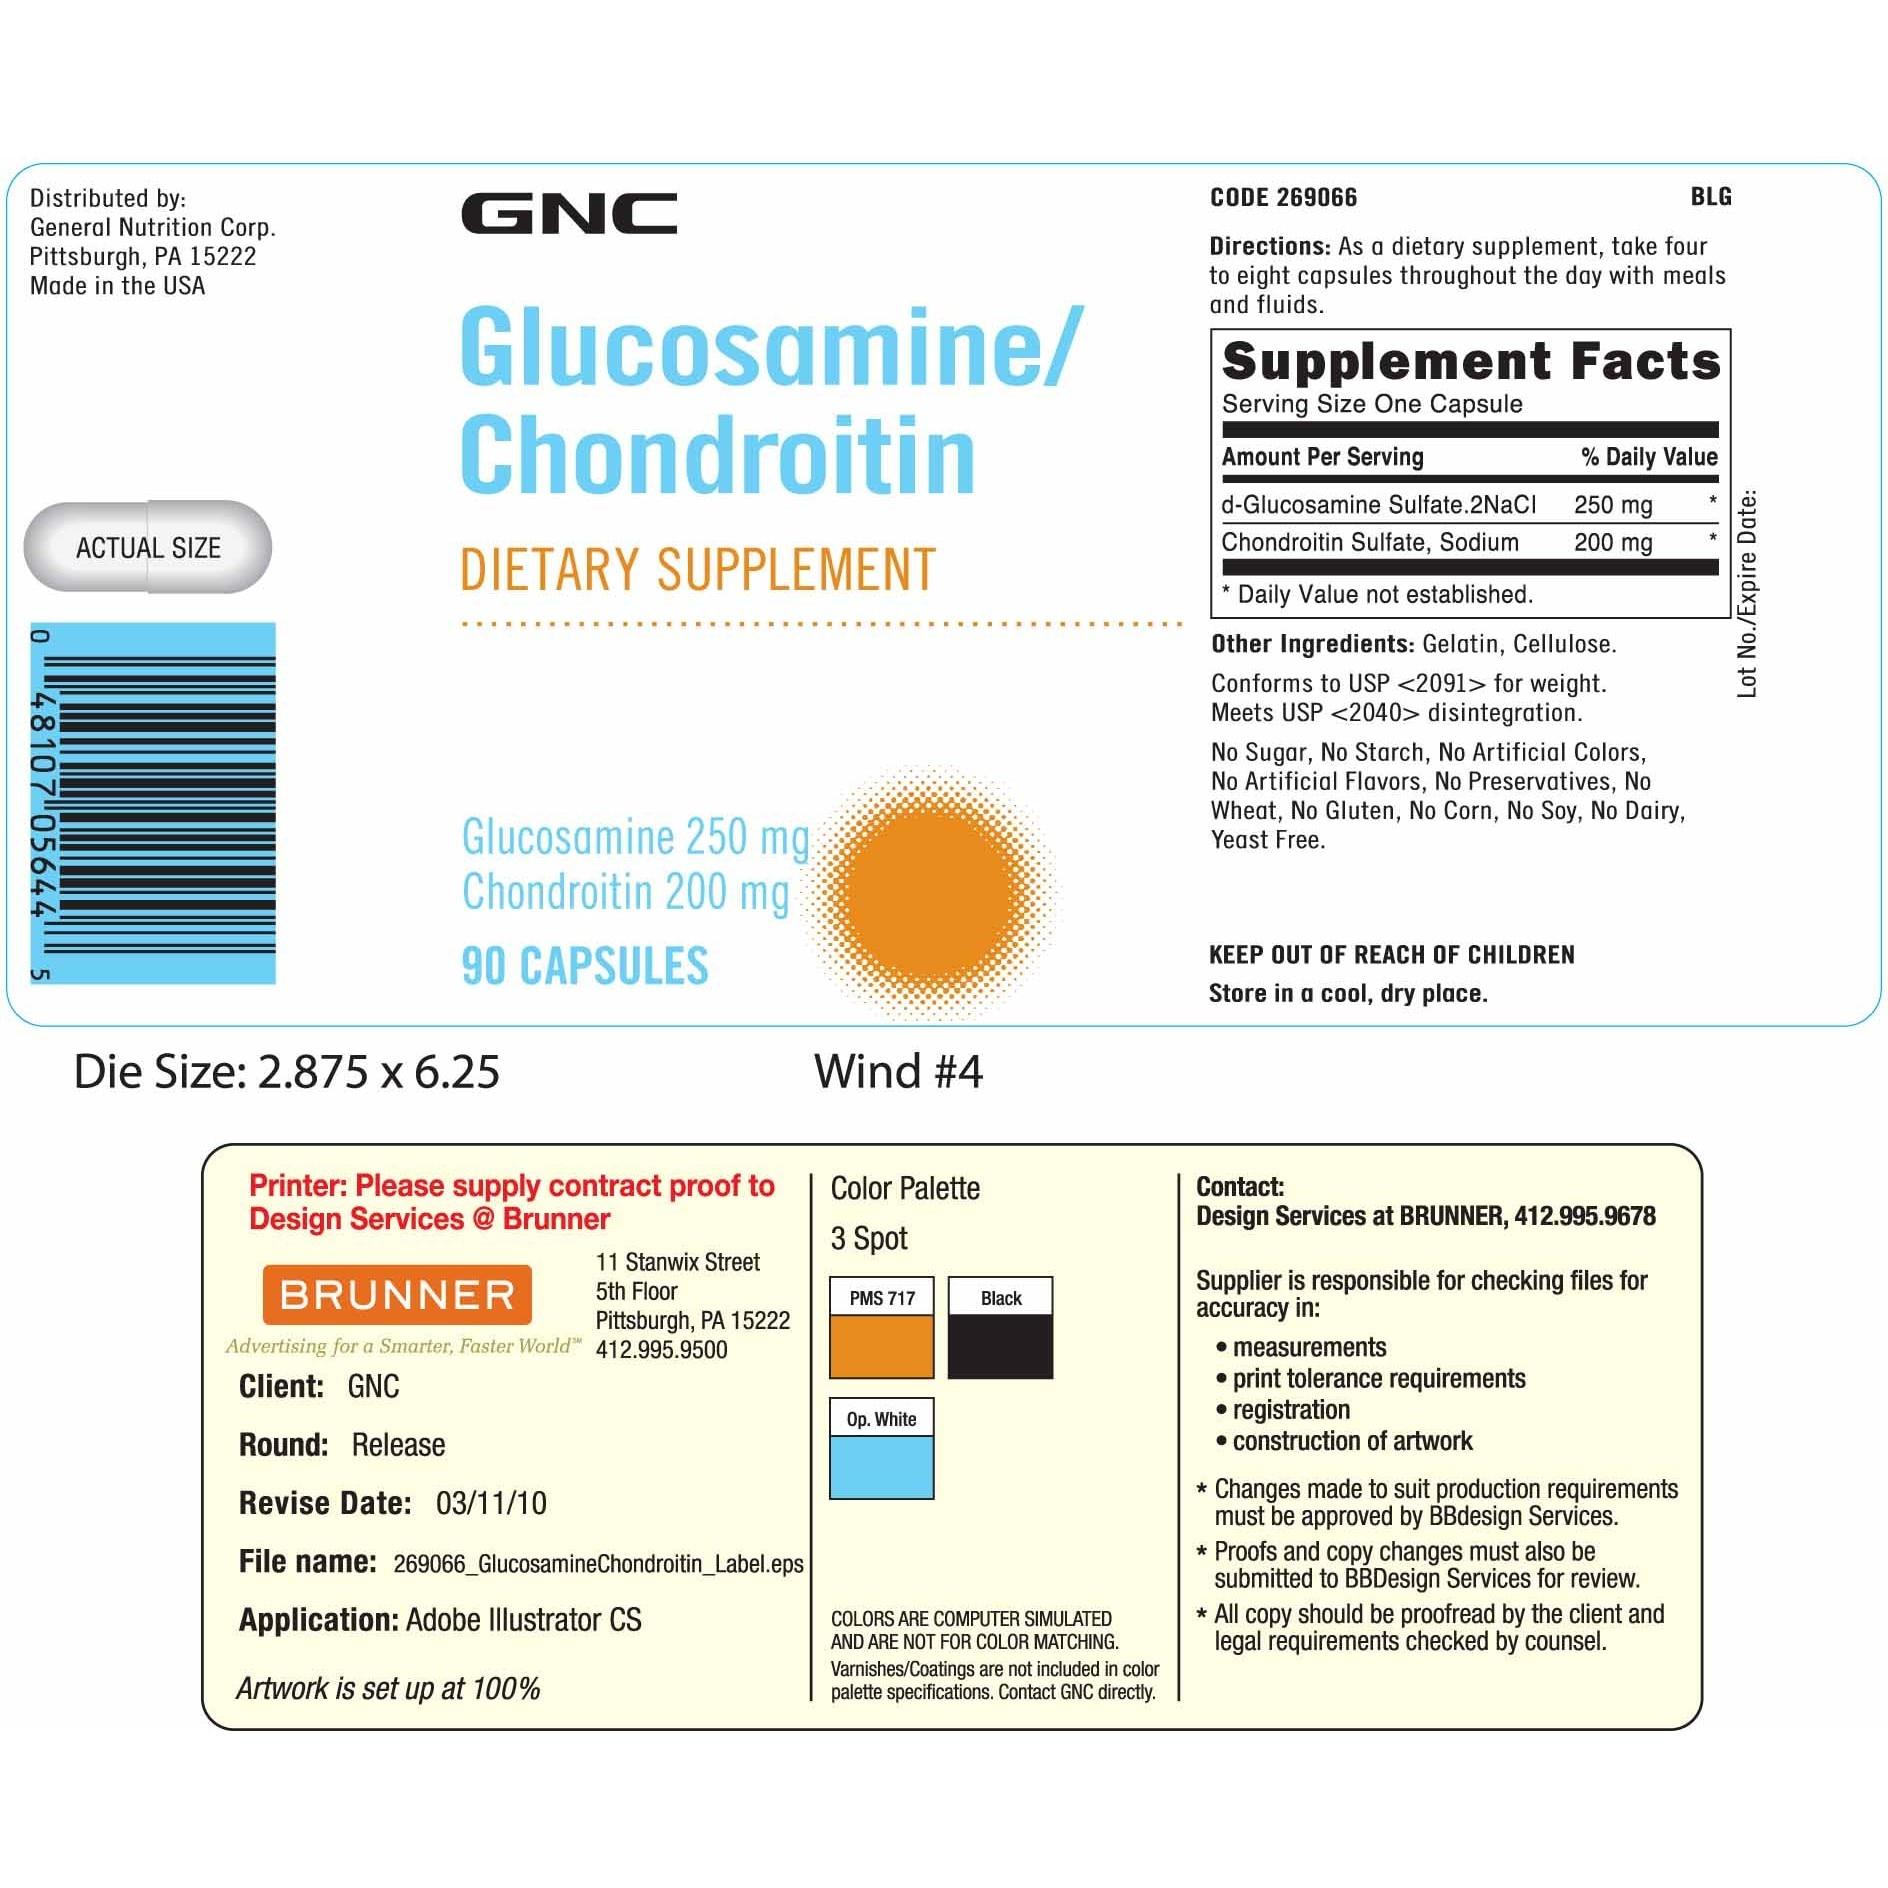 compoziția capsulei glucosaminei condroitină